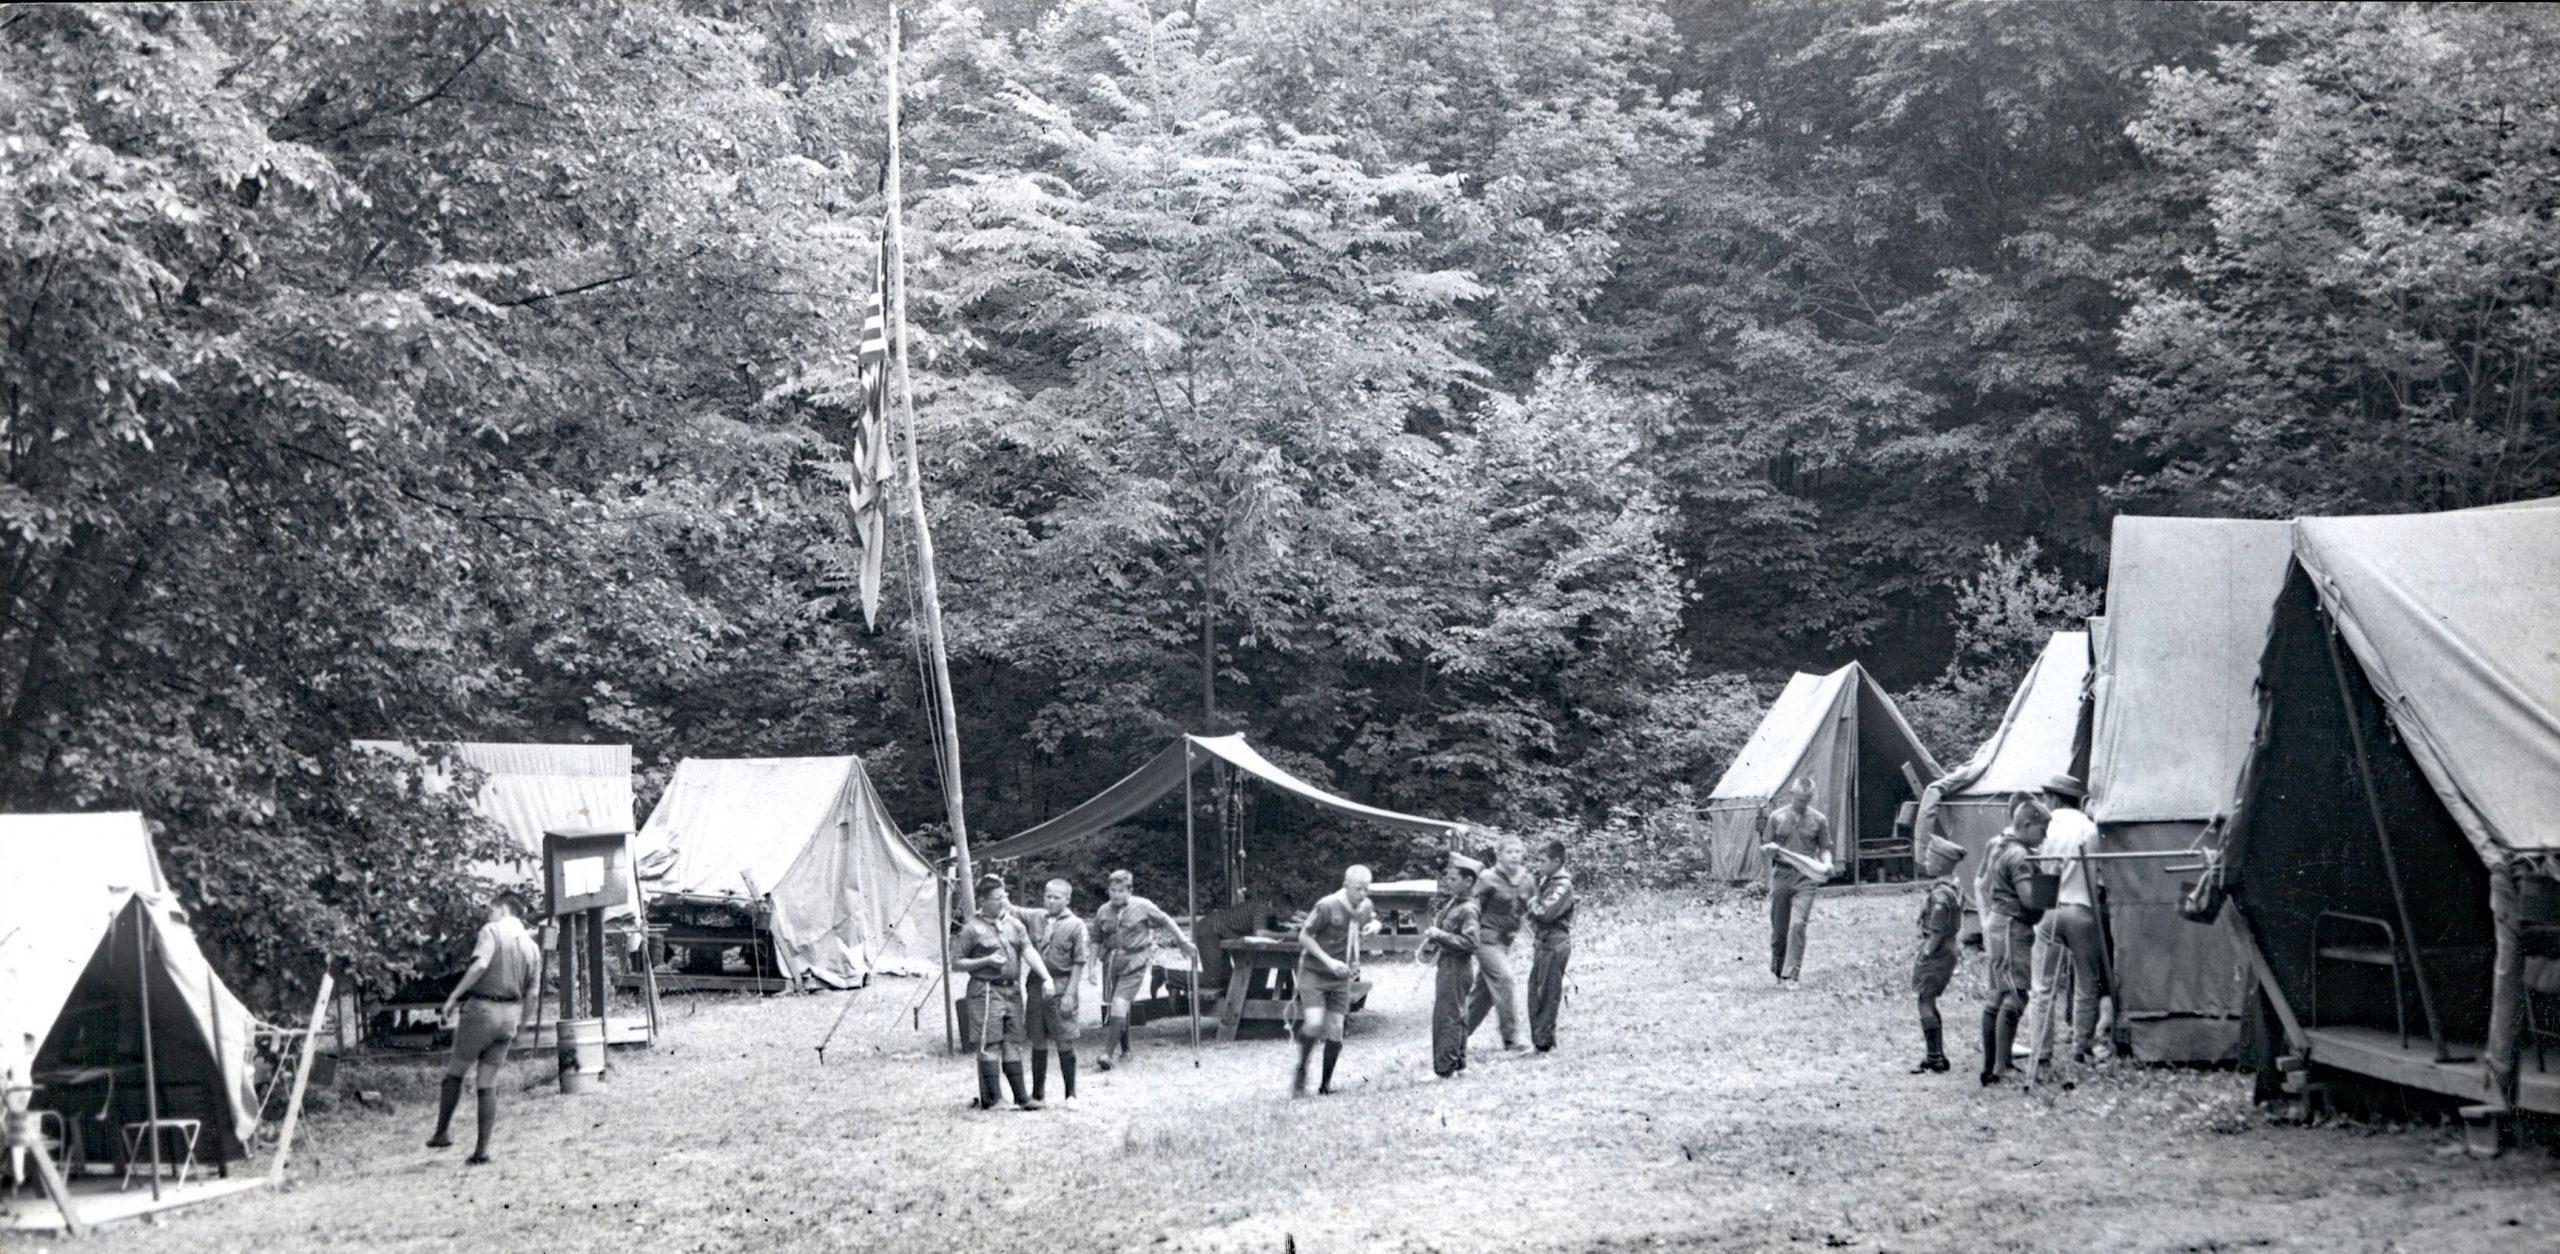 Turkey Campsite in 1945